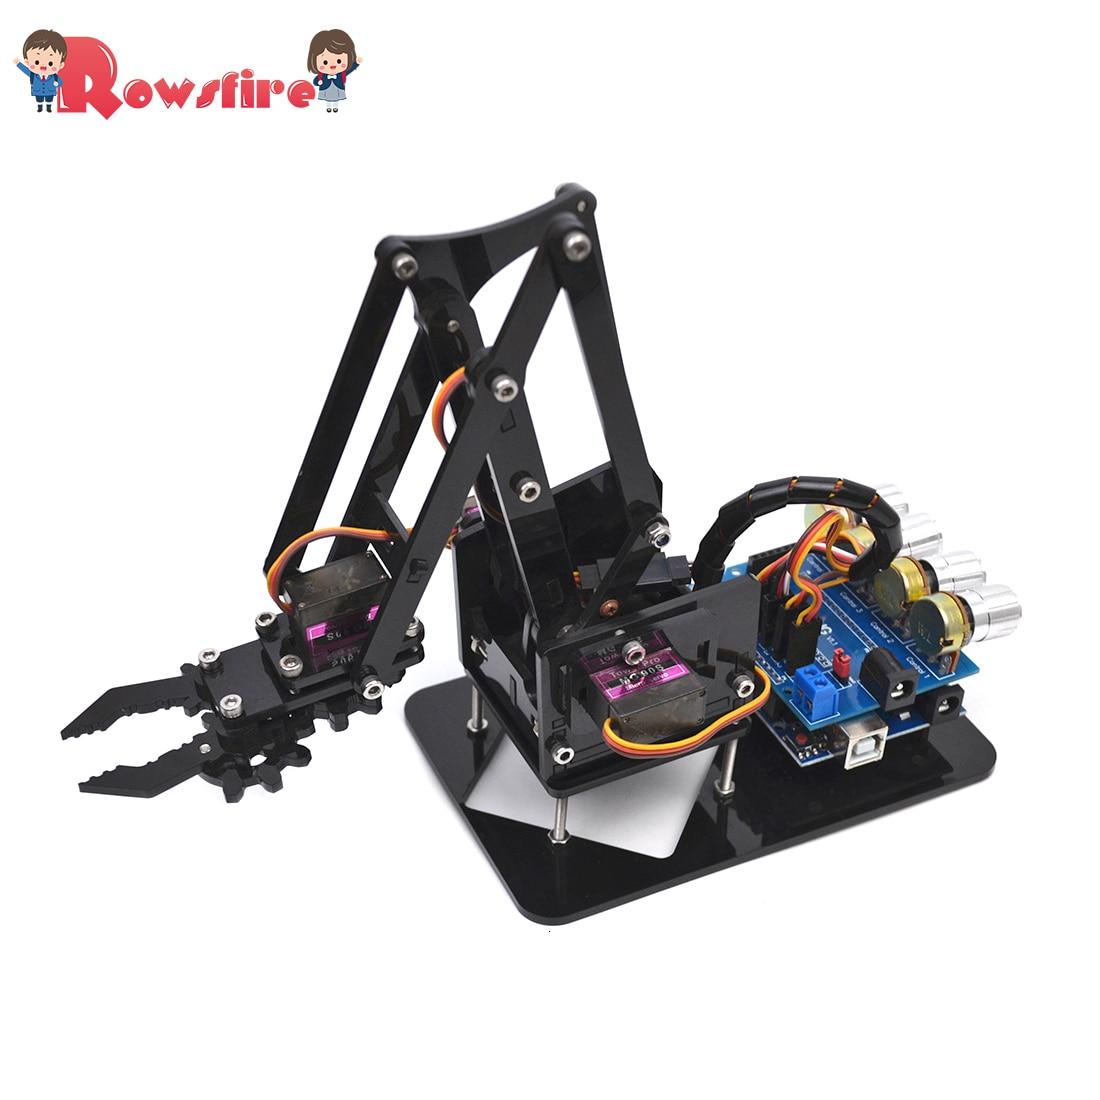 DIY Acrylic Robot Arm Robot Claw Arduino Kit 4DOF Mechanical Grab Manipulator